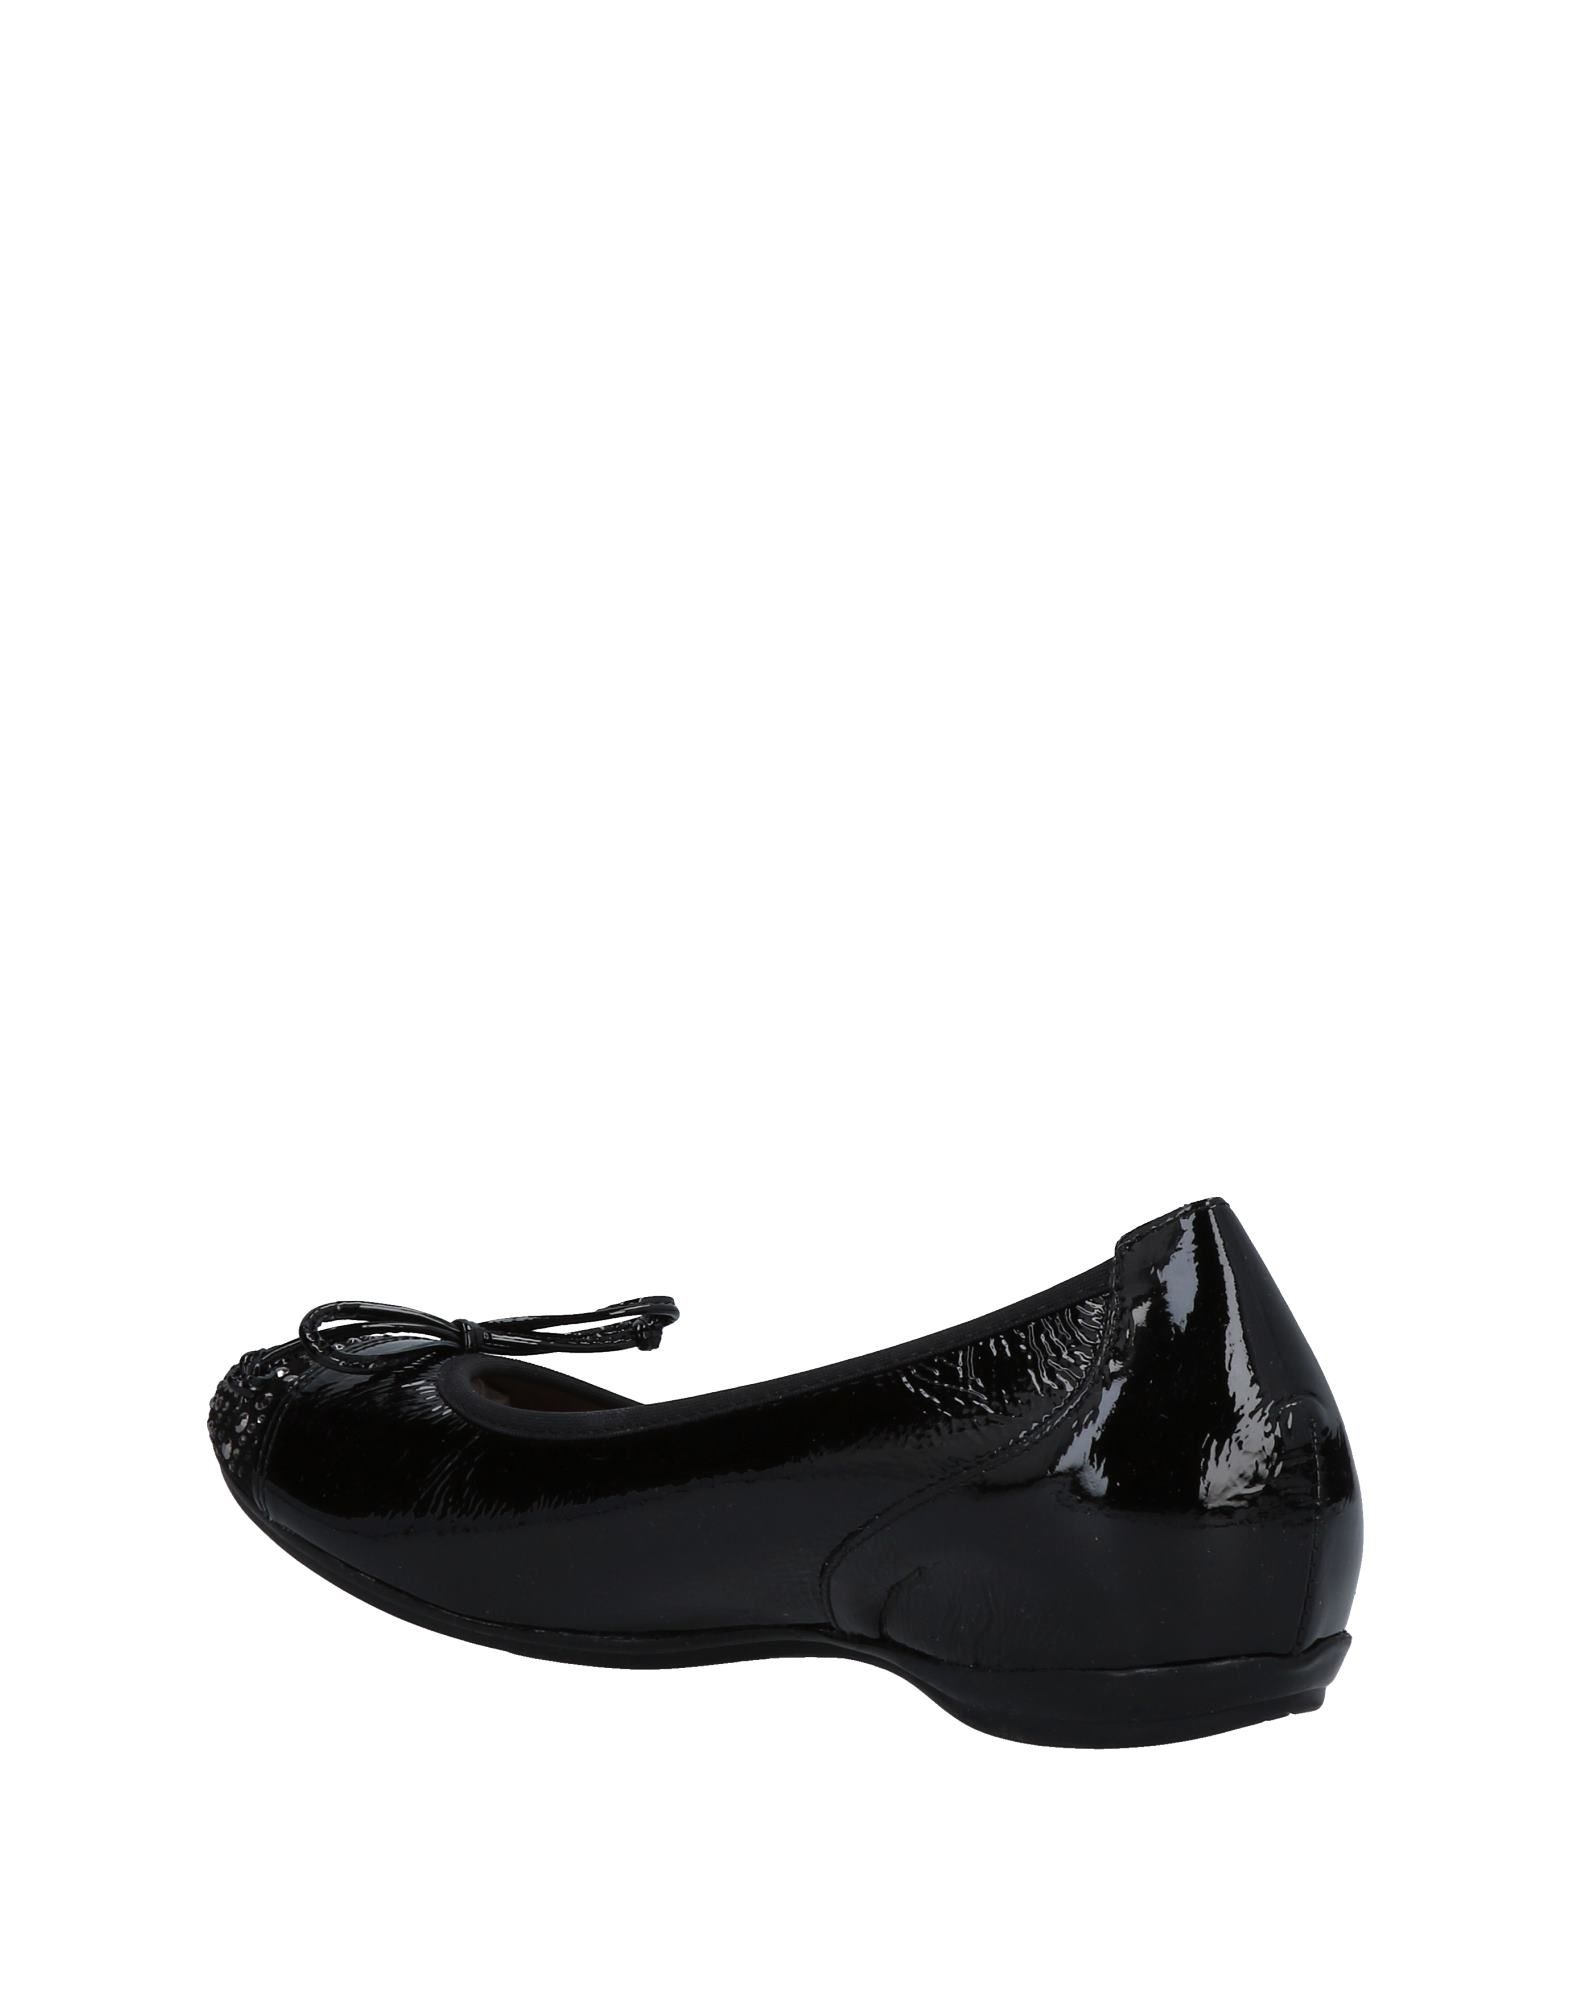 Wonders beliebte Ballerinas Damen 11482202QP Gute Qualität beliebte Wonders Schuhe ad33cd